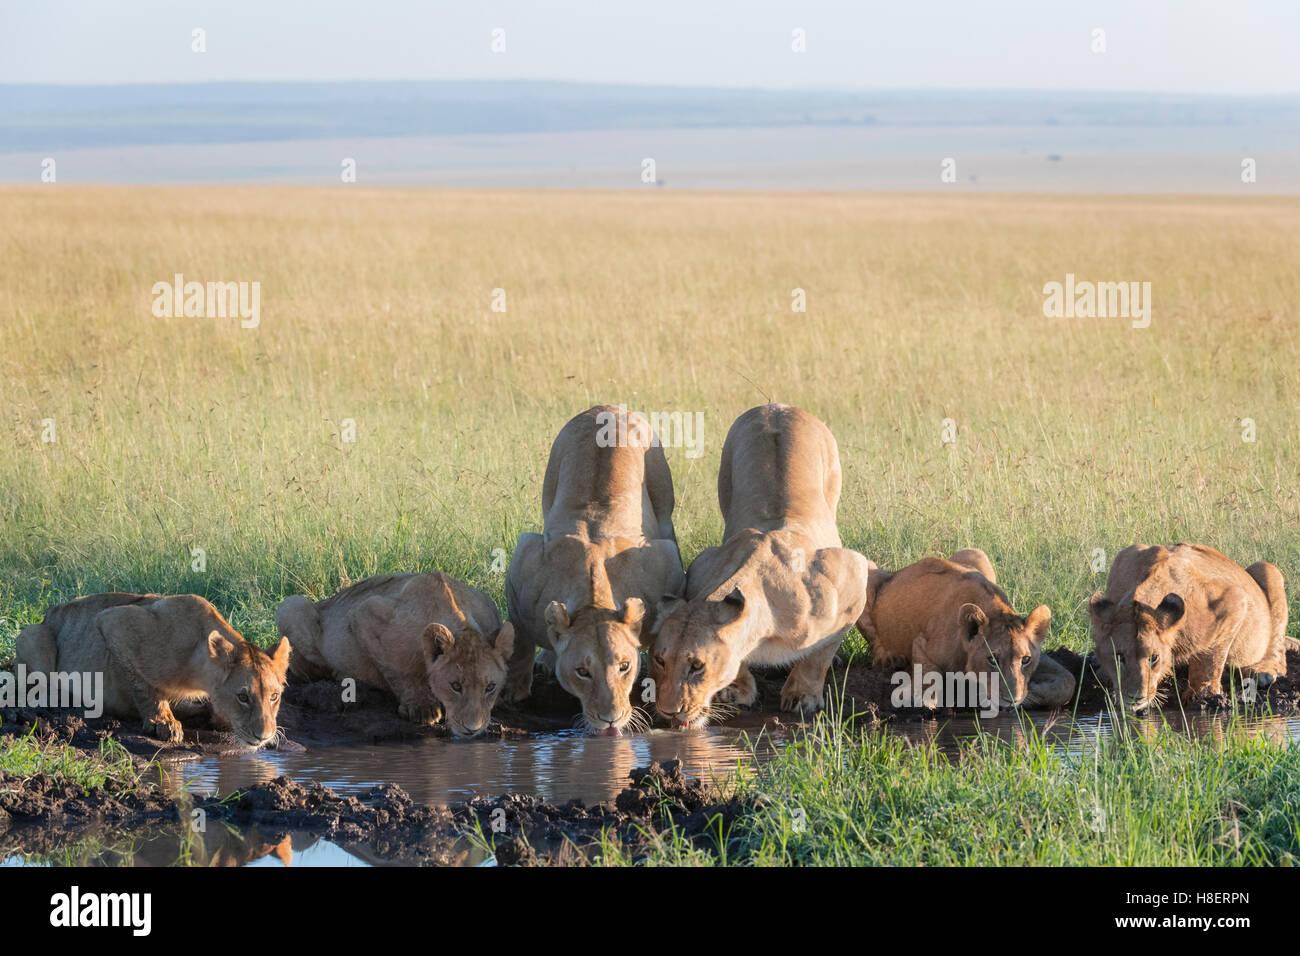 Lion (Panthera leo) pride drinking at a waterhole in the Masai Mara National Reserve, Kenya - Stock Image